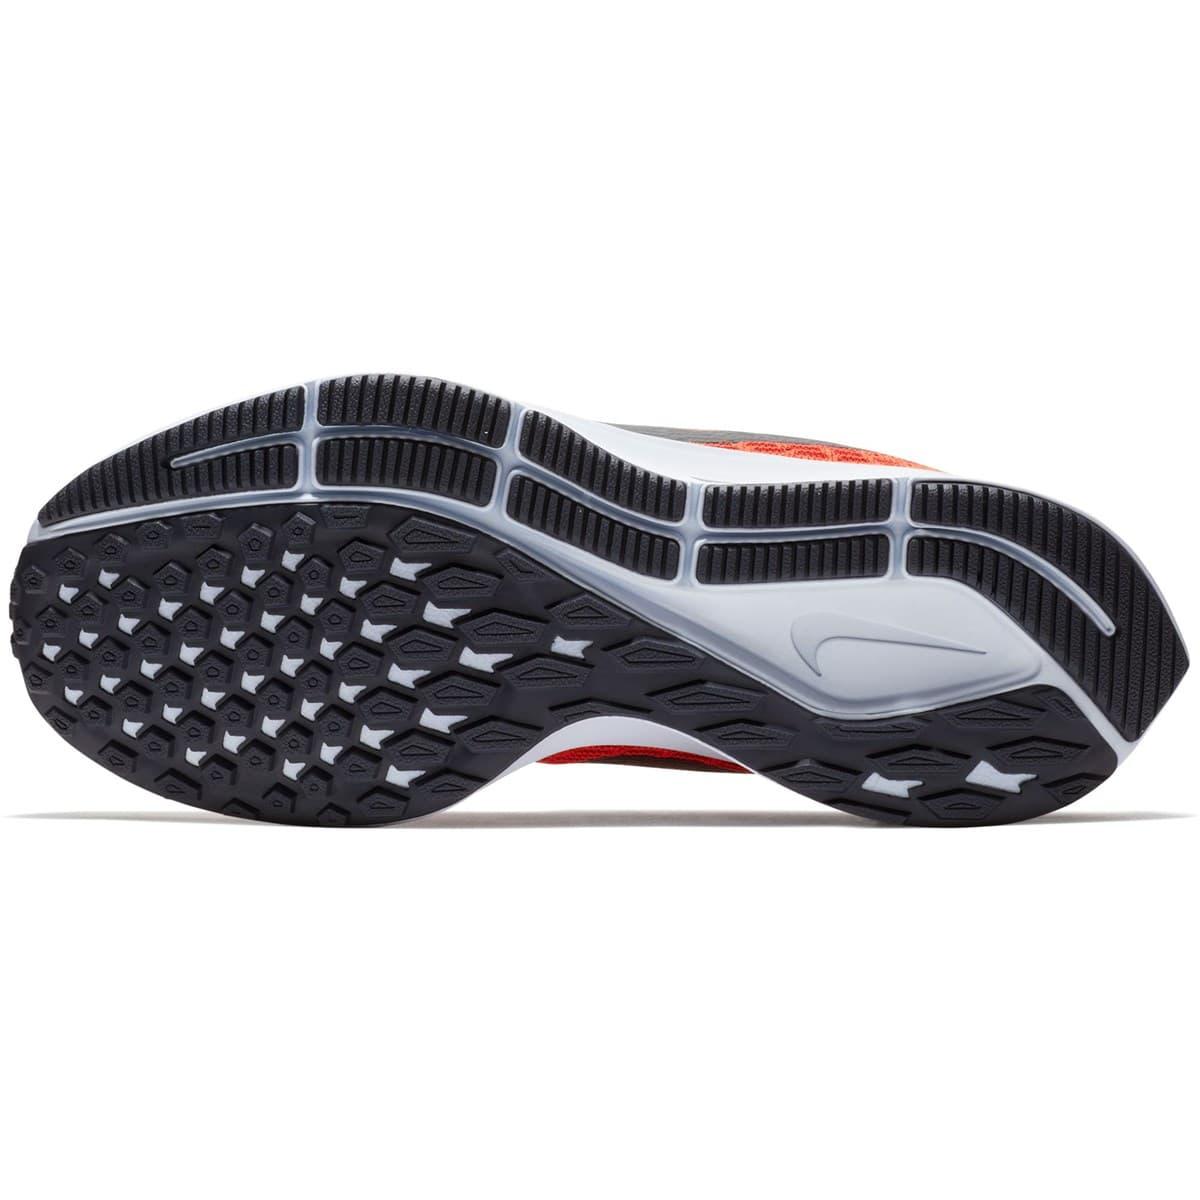 Air Zoom Pegasus 35 Kırmızı Koşu Ayakkabısı